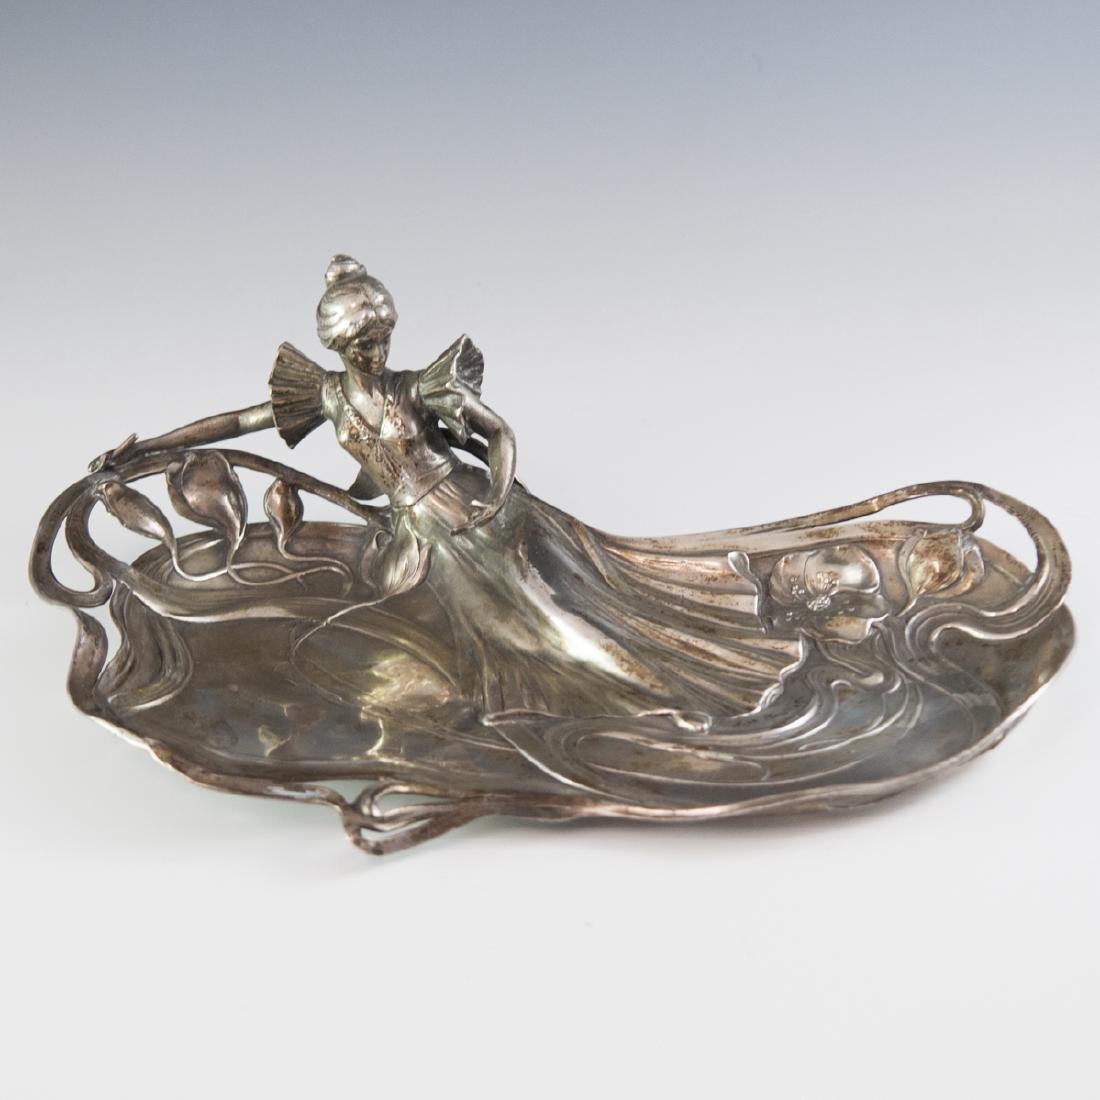 WMF Silver Plated Art Nouveau Dish